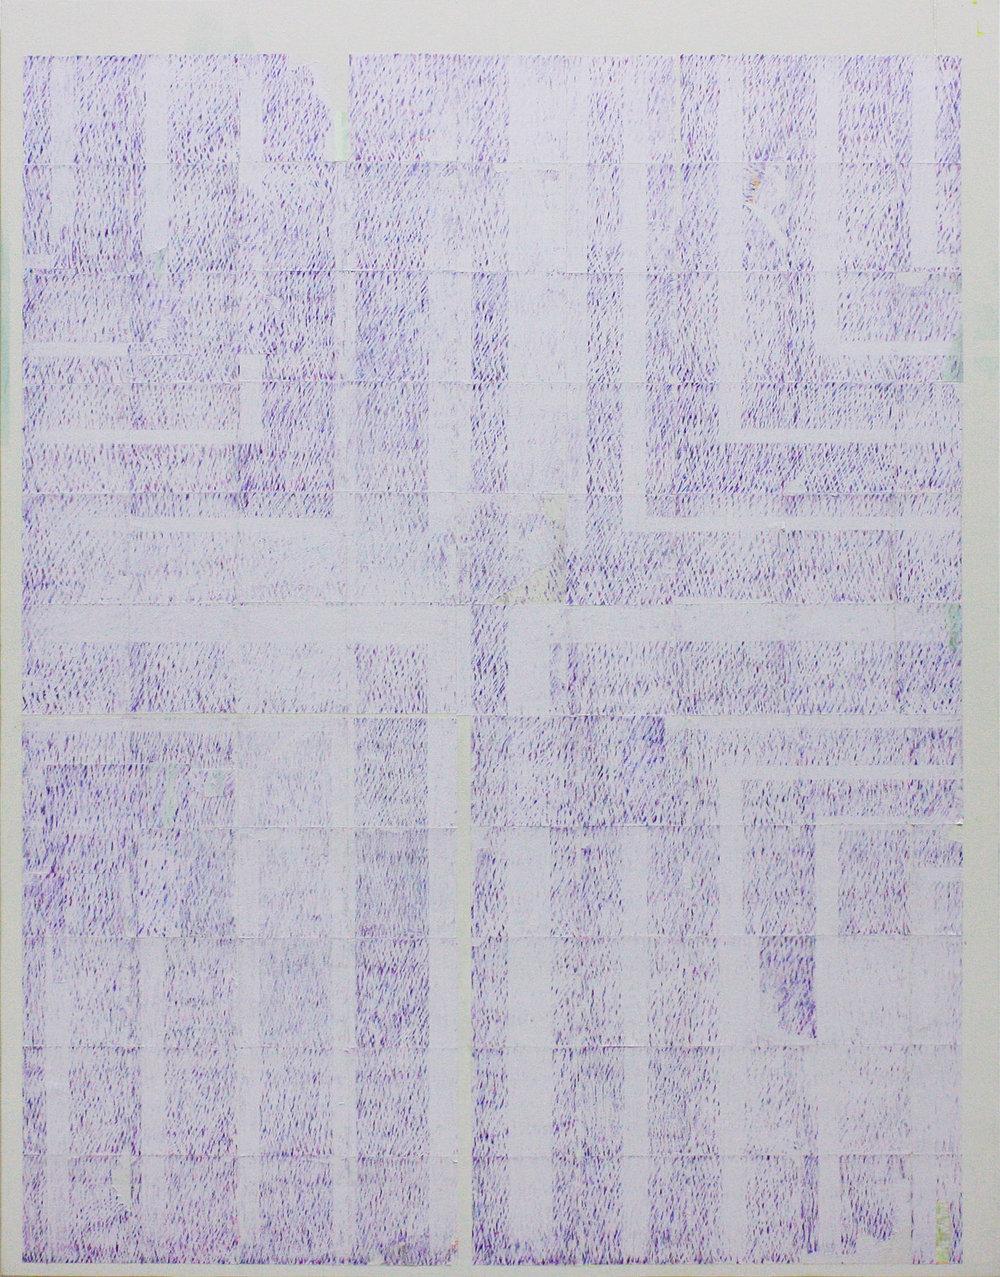 Backlight, 2016, tecnica mista su tela, 90x60 cm